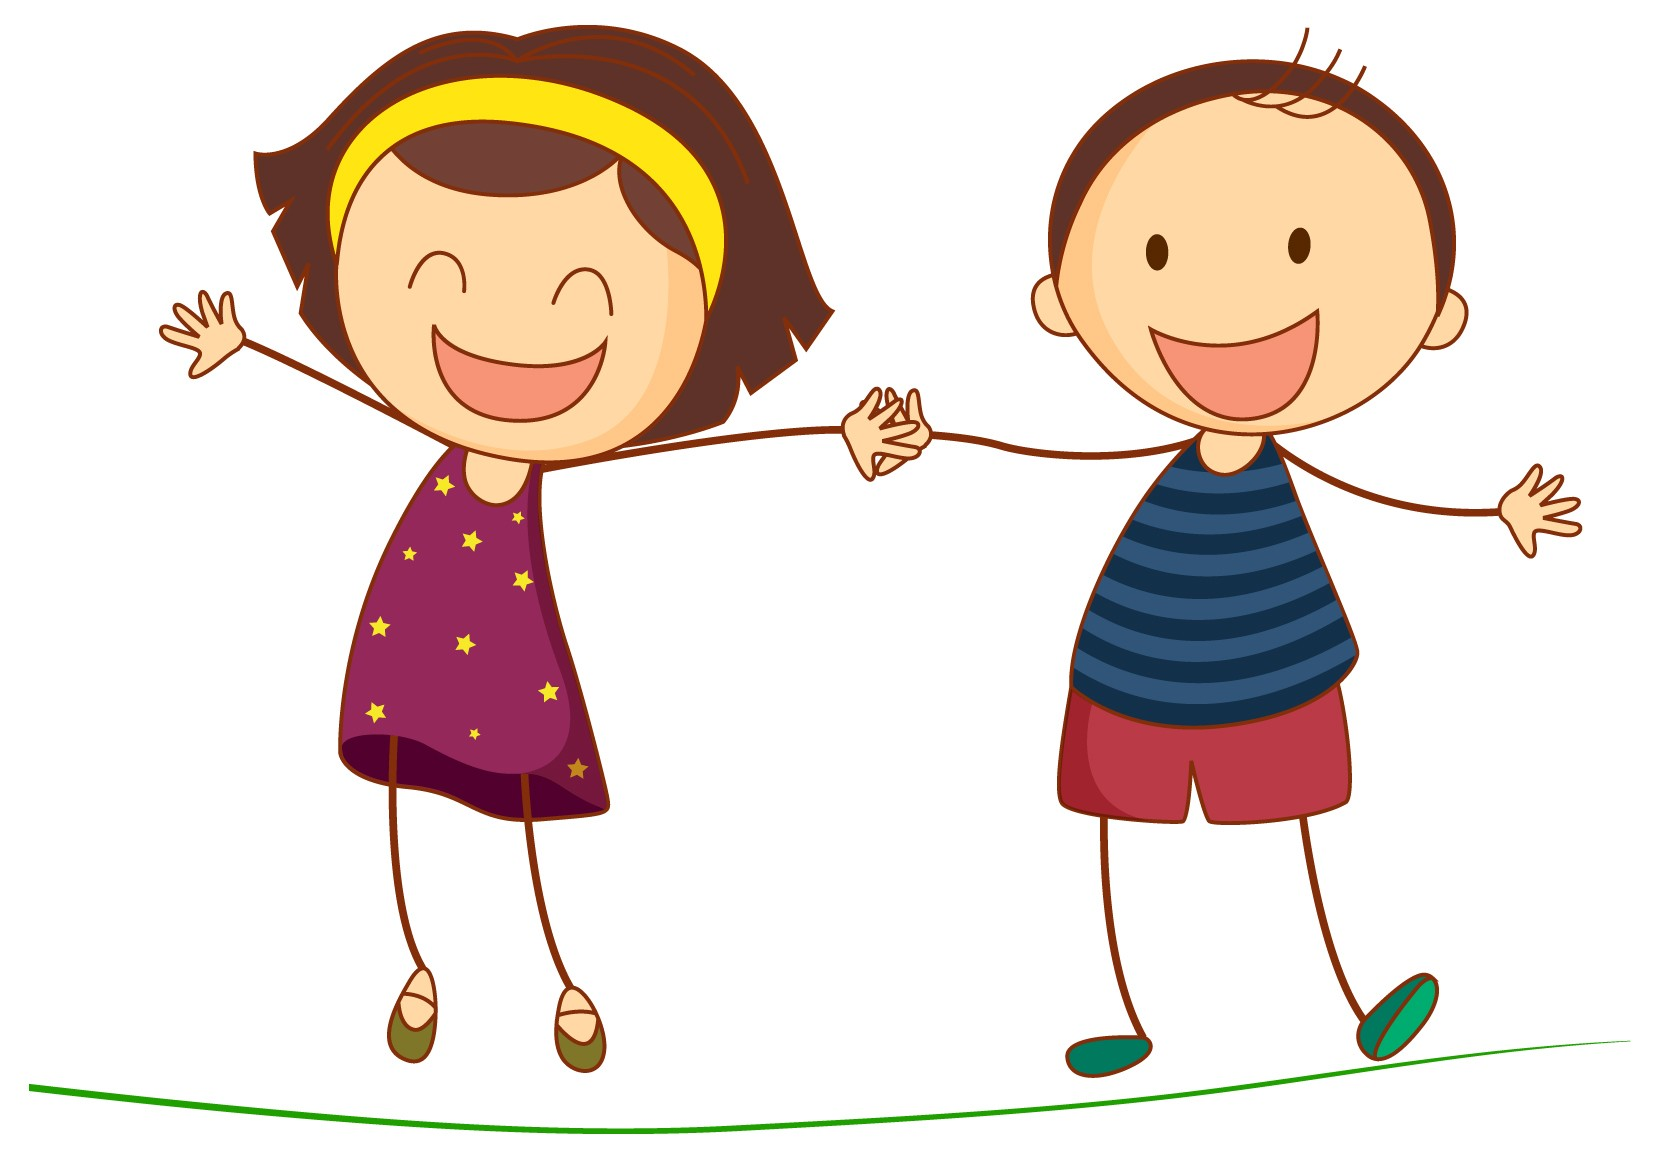 Cartoon Children Playing At School - ClipArt Best